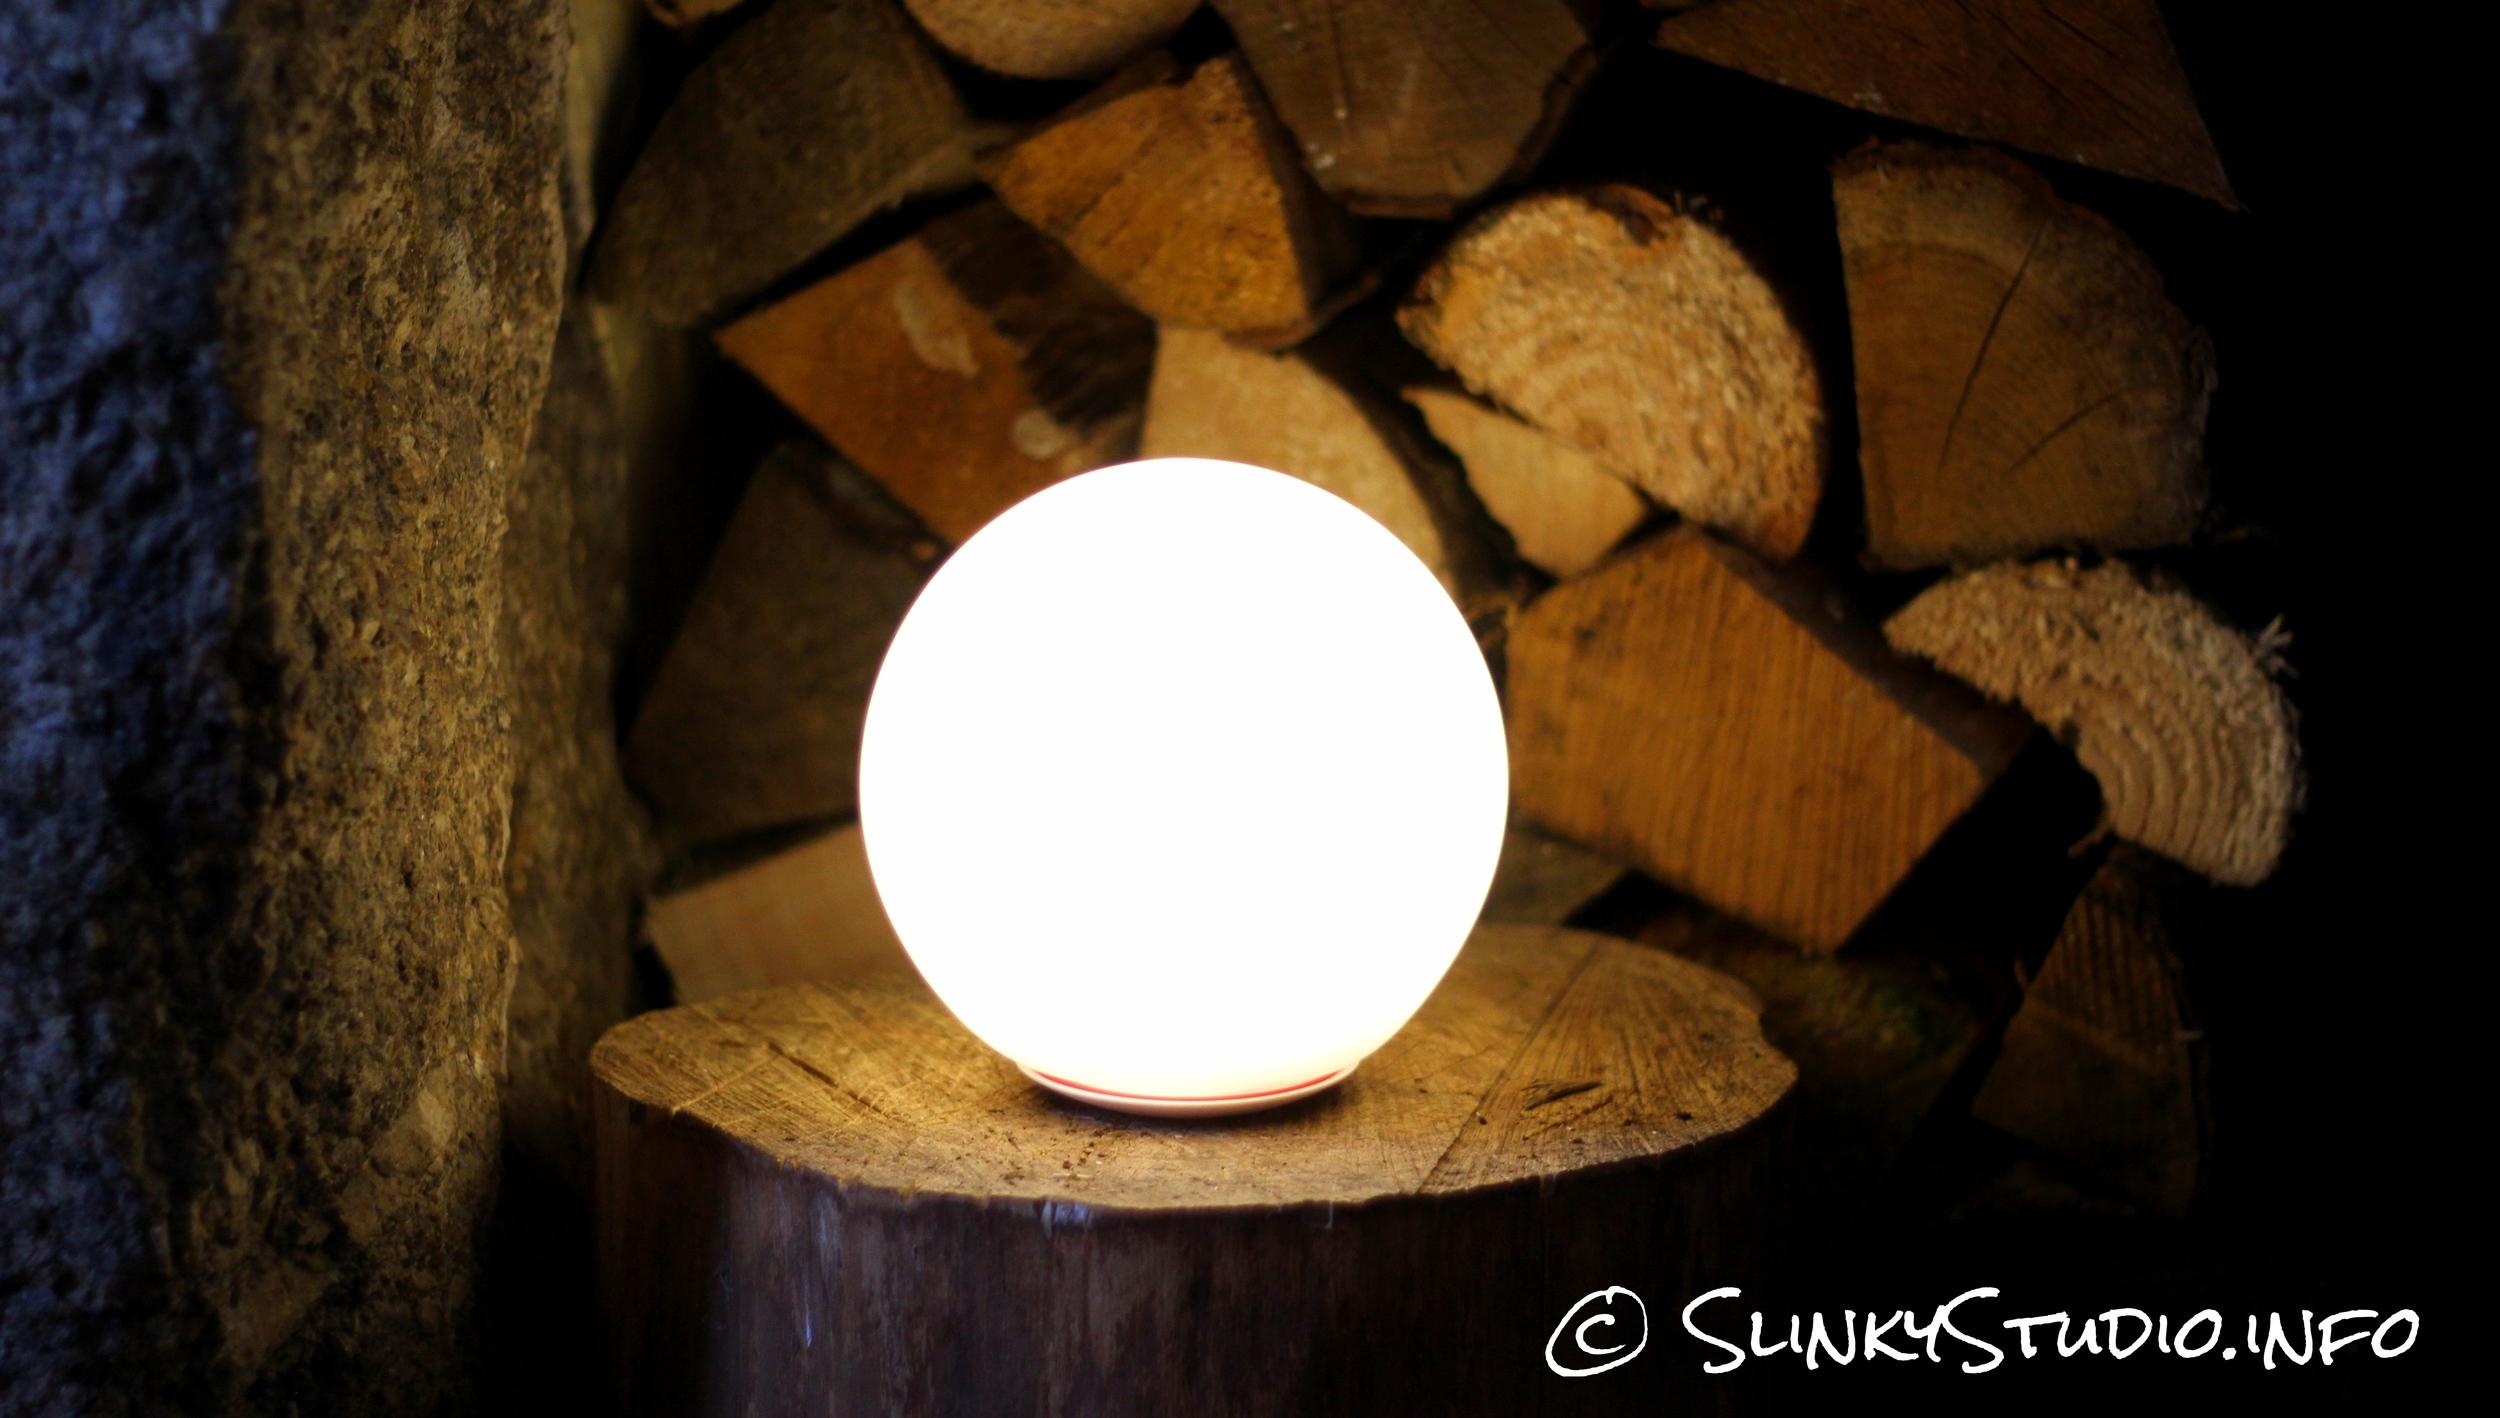 MiPow Playbulb Sphere Light